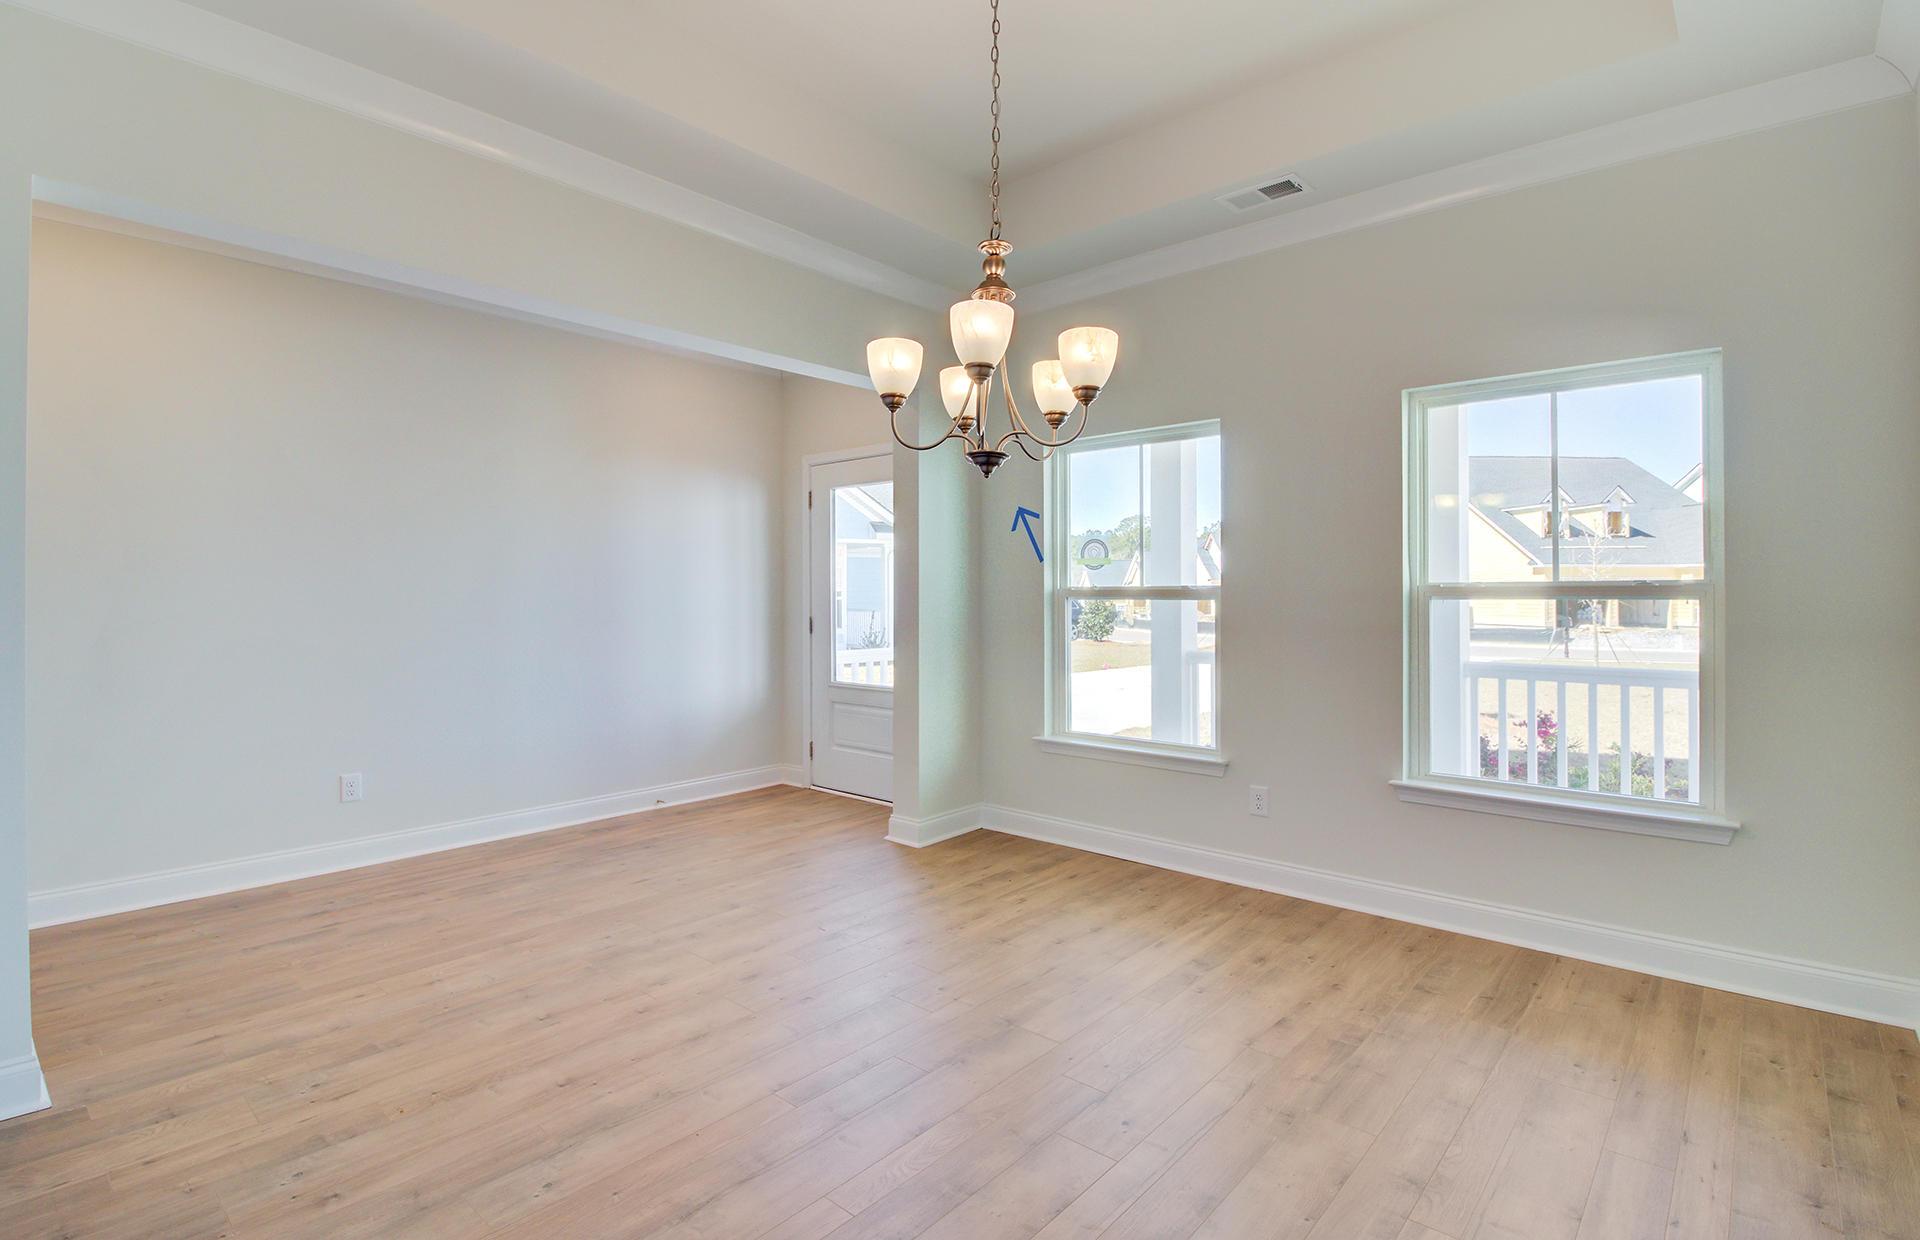 Park West Homes For Sale - 3030 Rice Field, Mount Pleasant, SC - 25